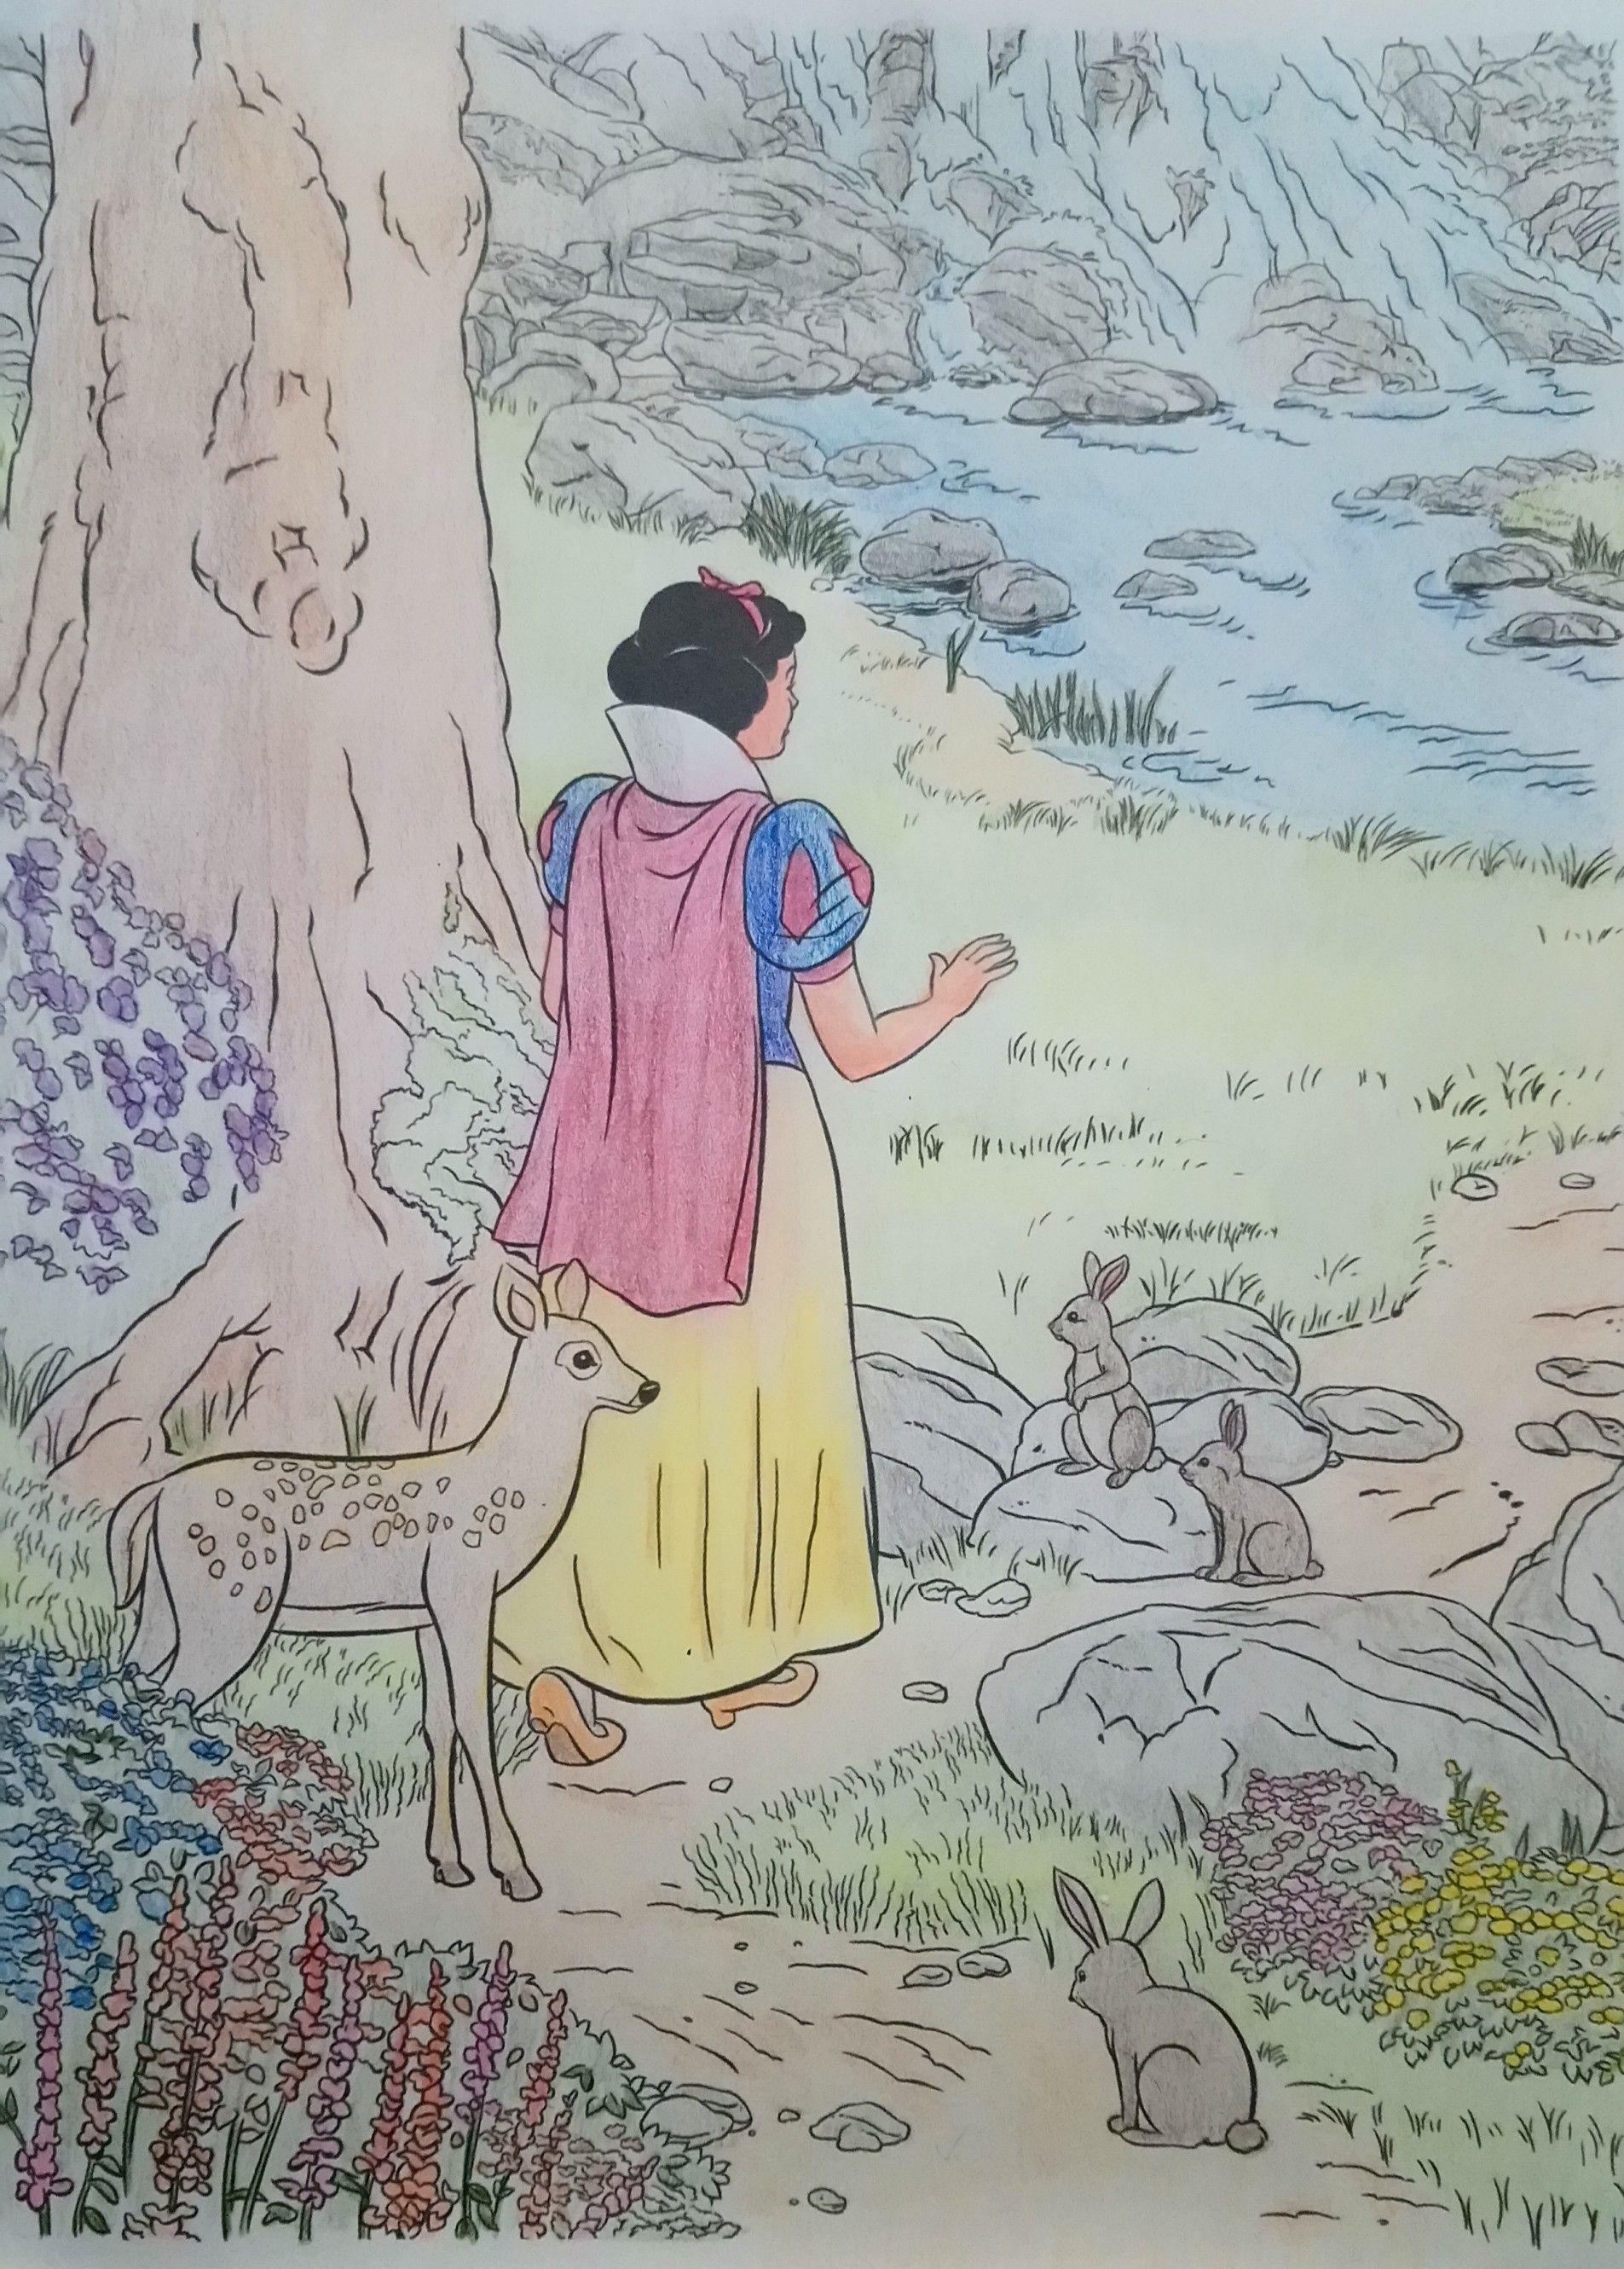 Snow White From Disney Dreams Collection Thomas Kinkade Studios Coloring Book By Thomas Kinkade Disney Dream Coloring Books Thomas Kinkade